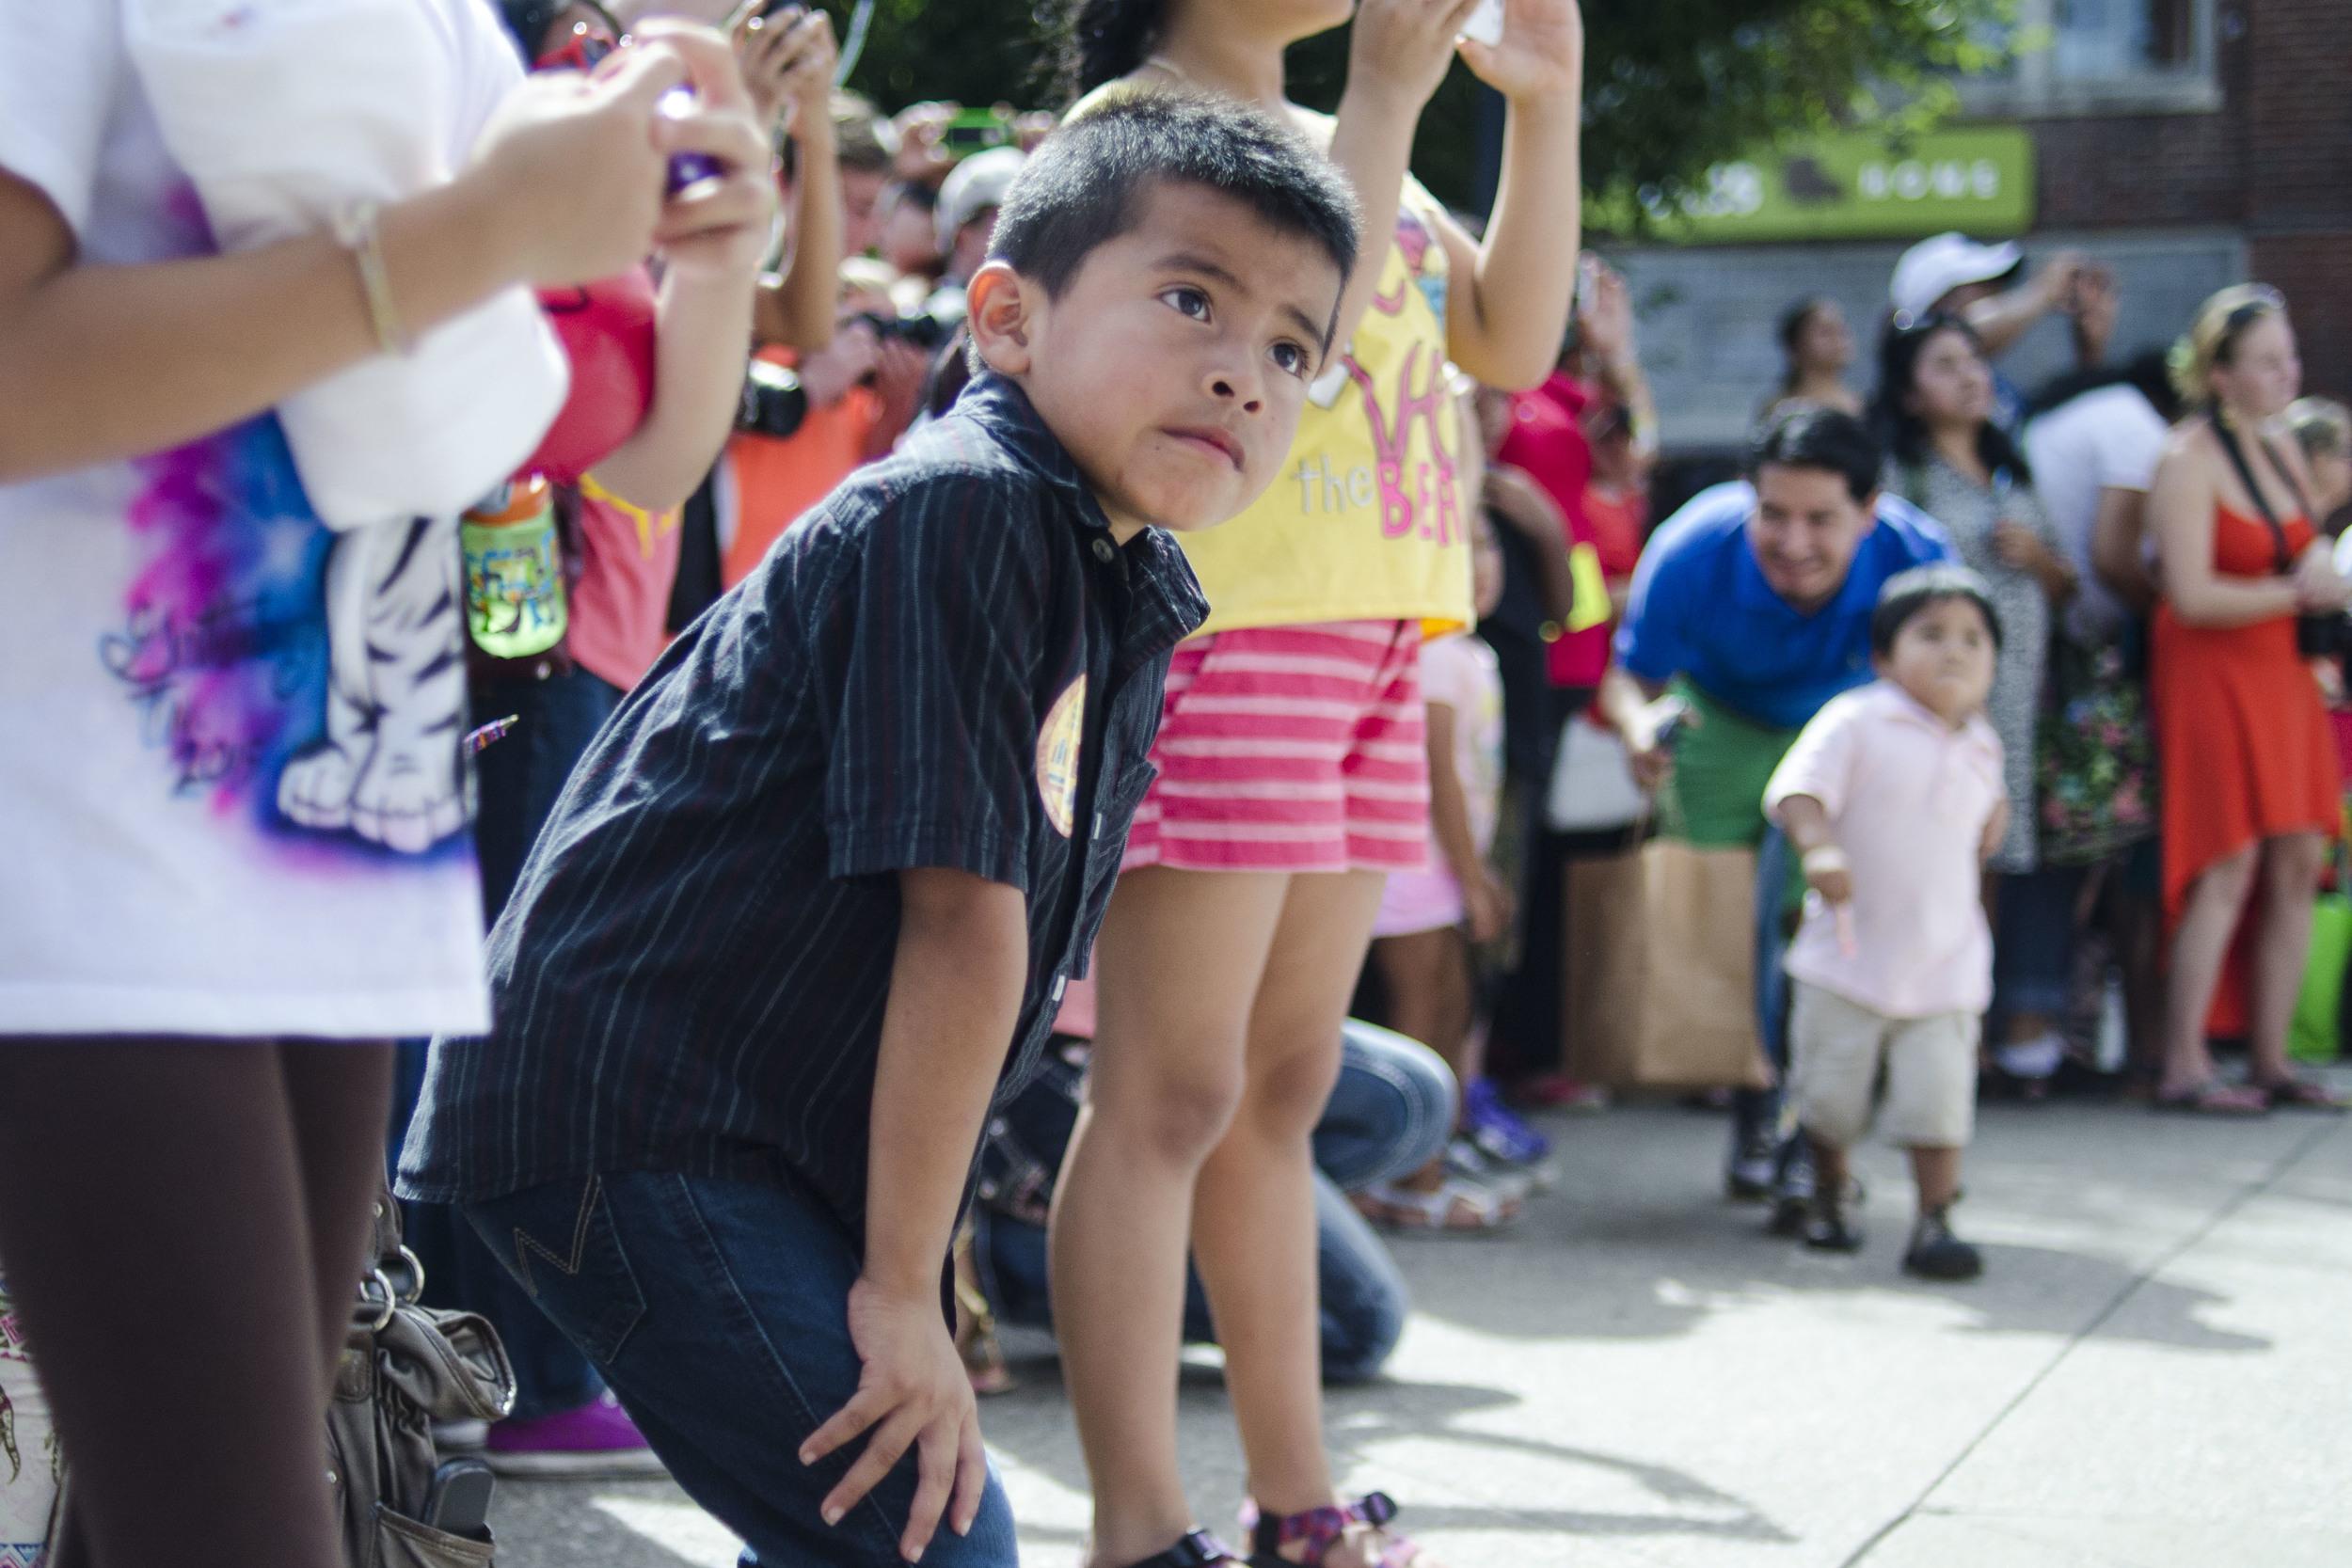 Samuel Betanco, 6,anticipates the parade's finale in Market Square.